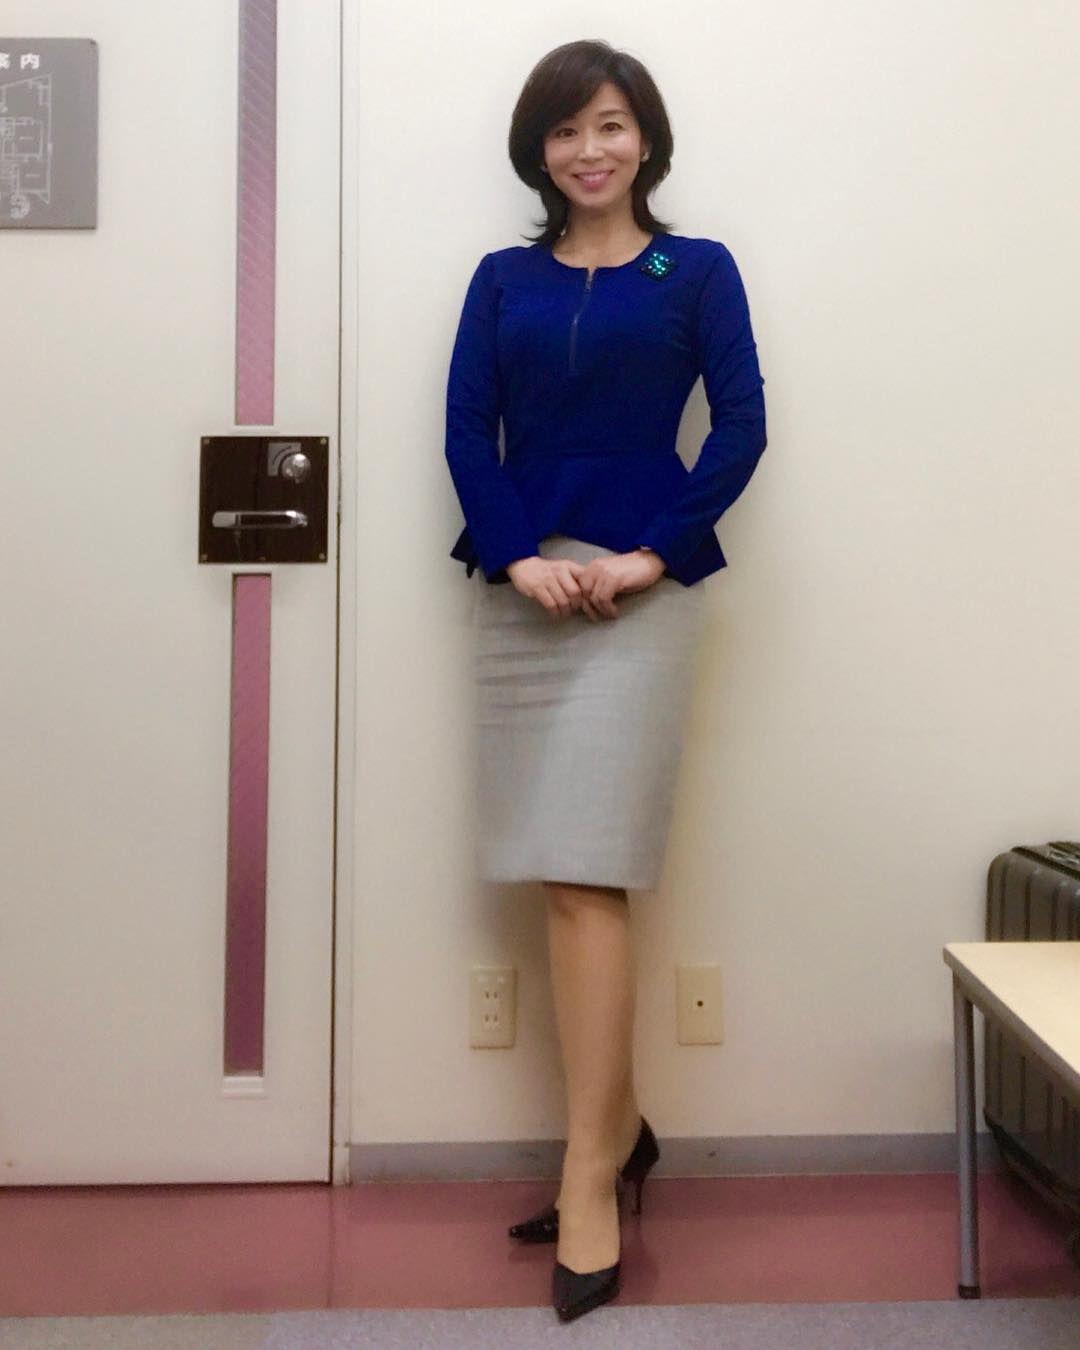 Satoko ito instagram for Teichfass anlegen